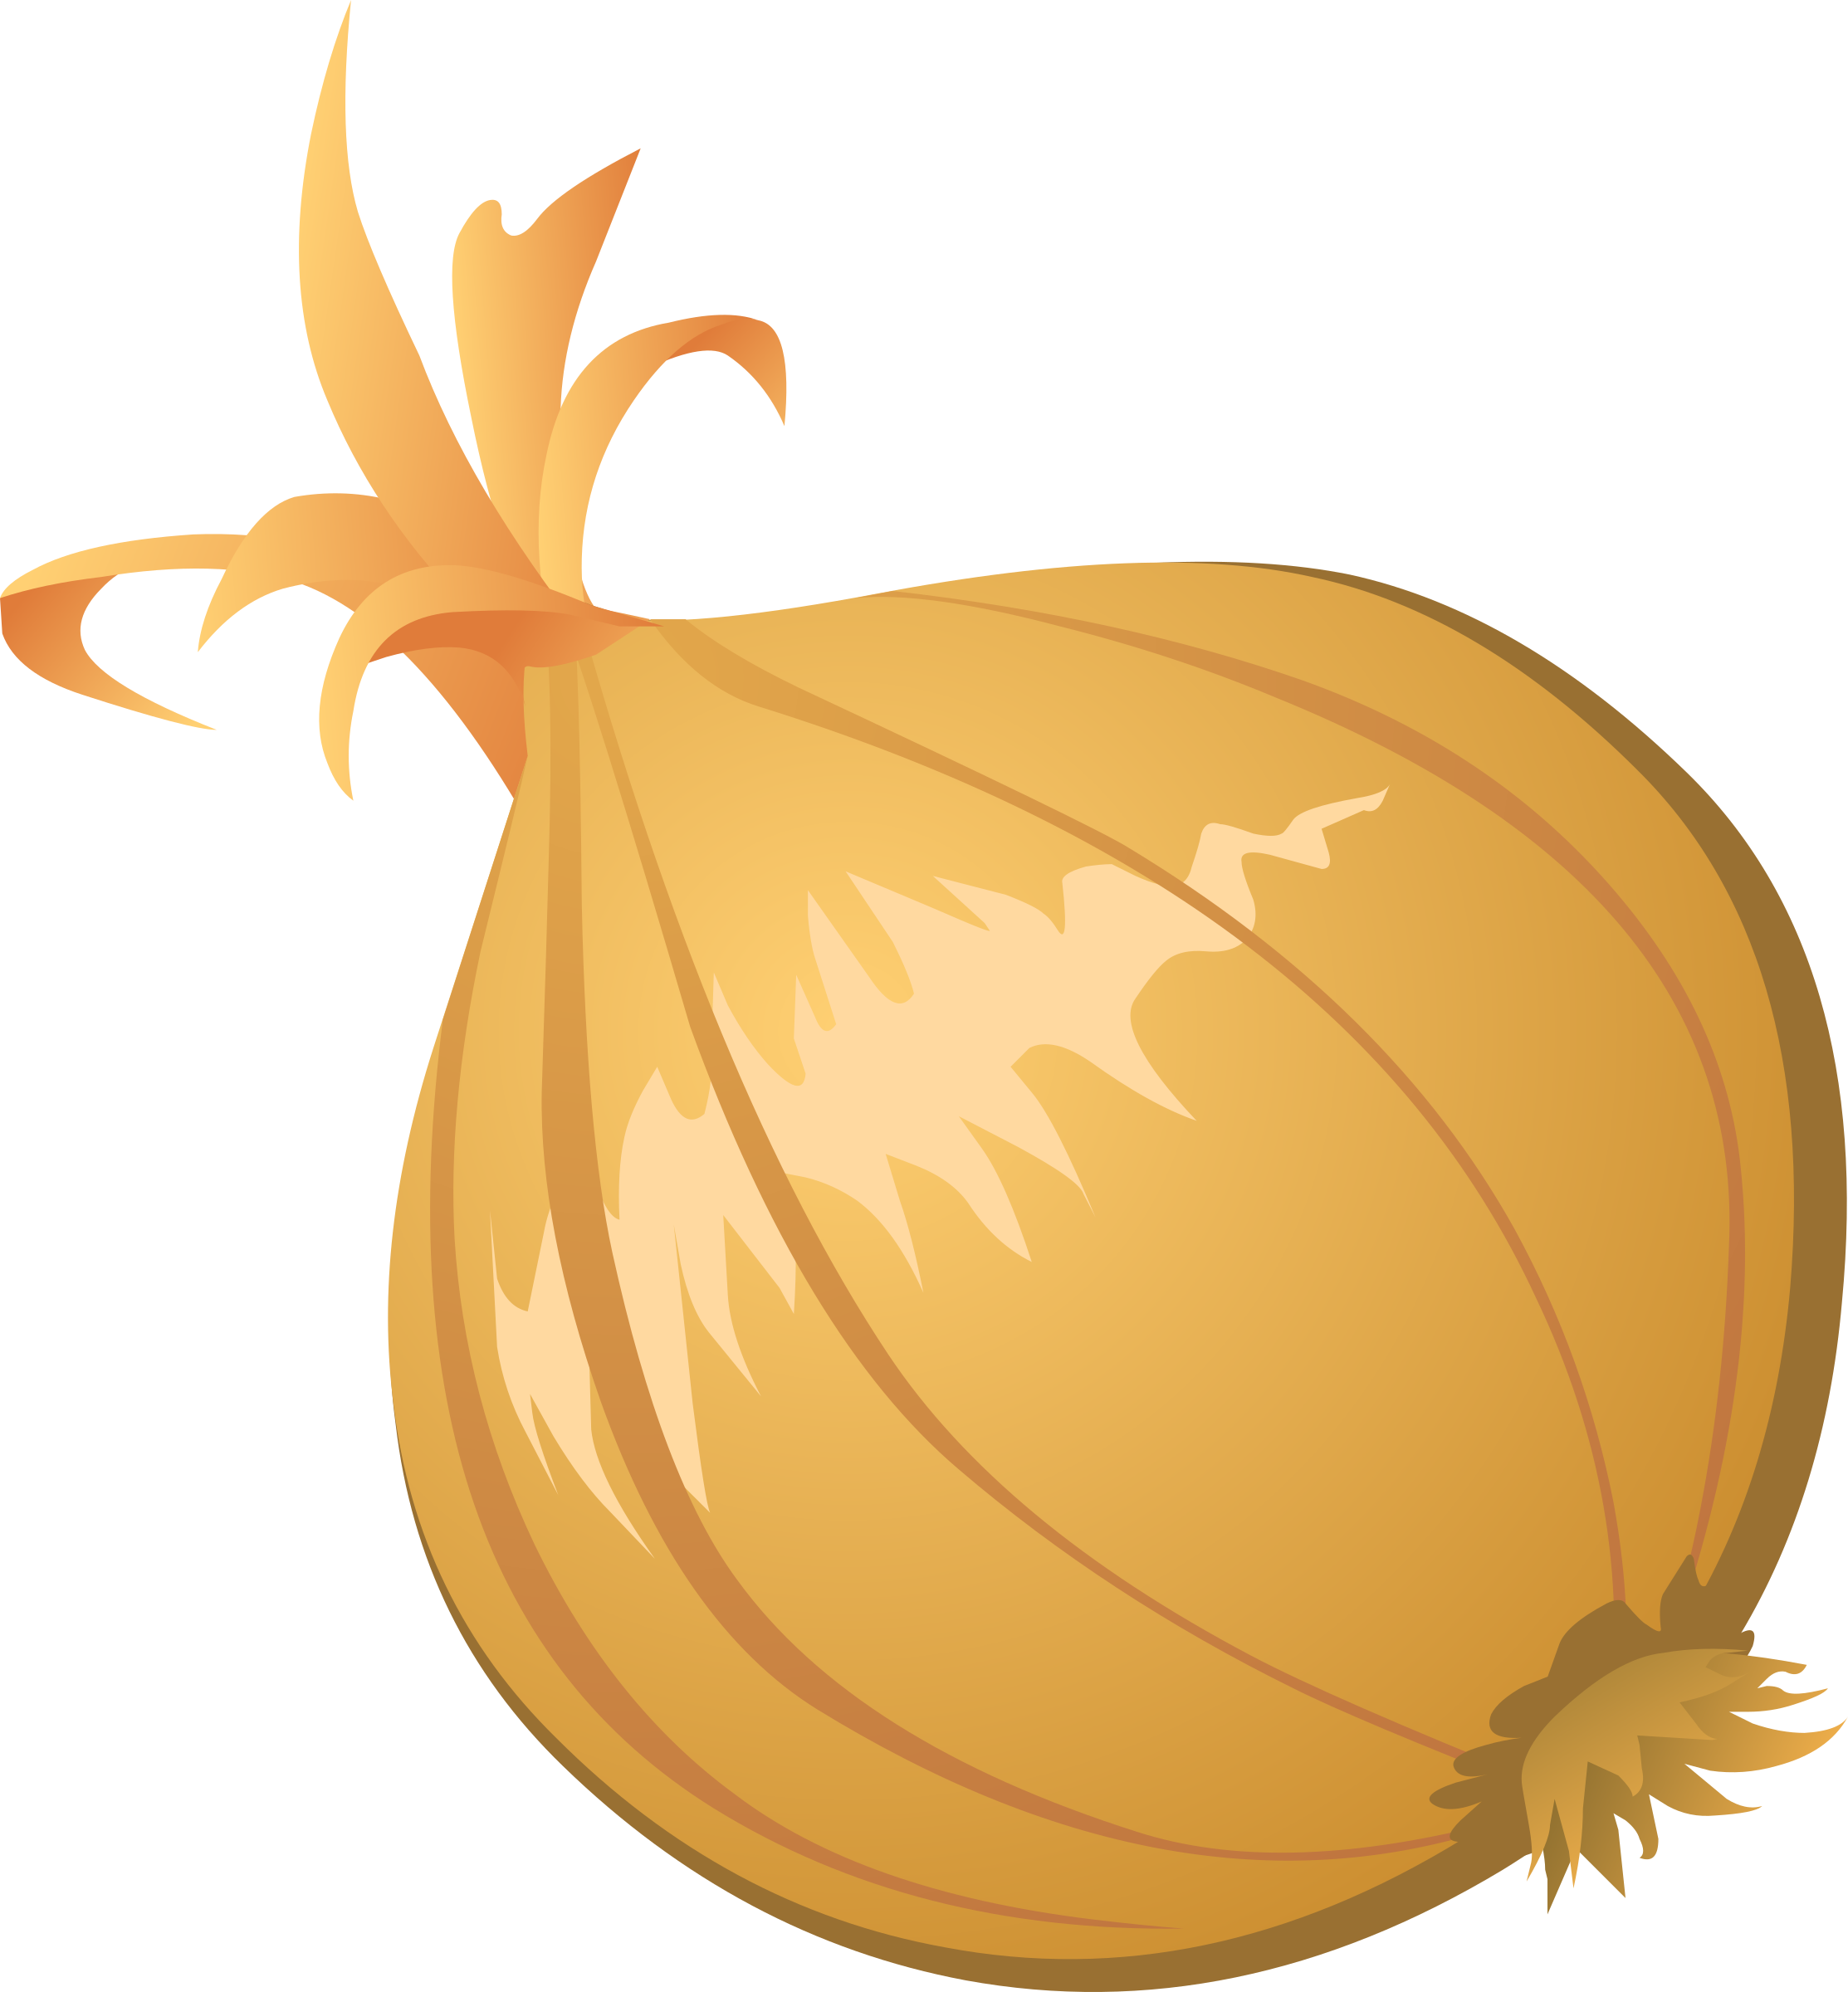 Food big image png. Onion clipart onion slice